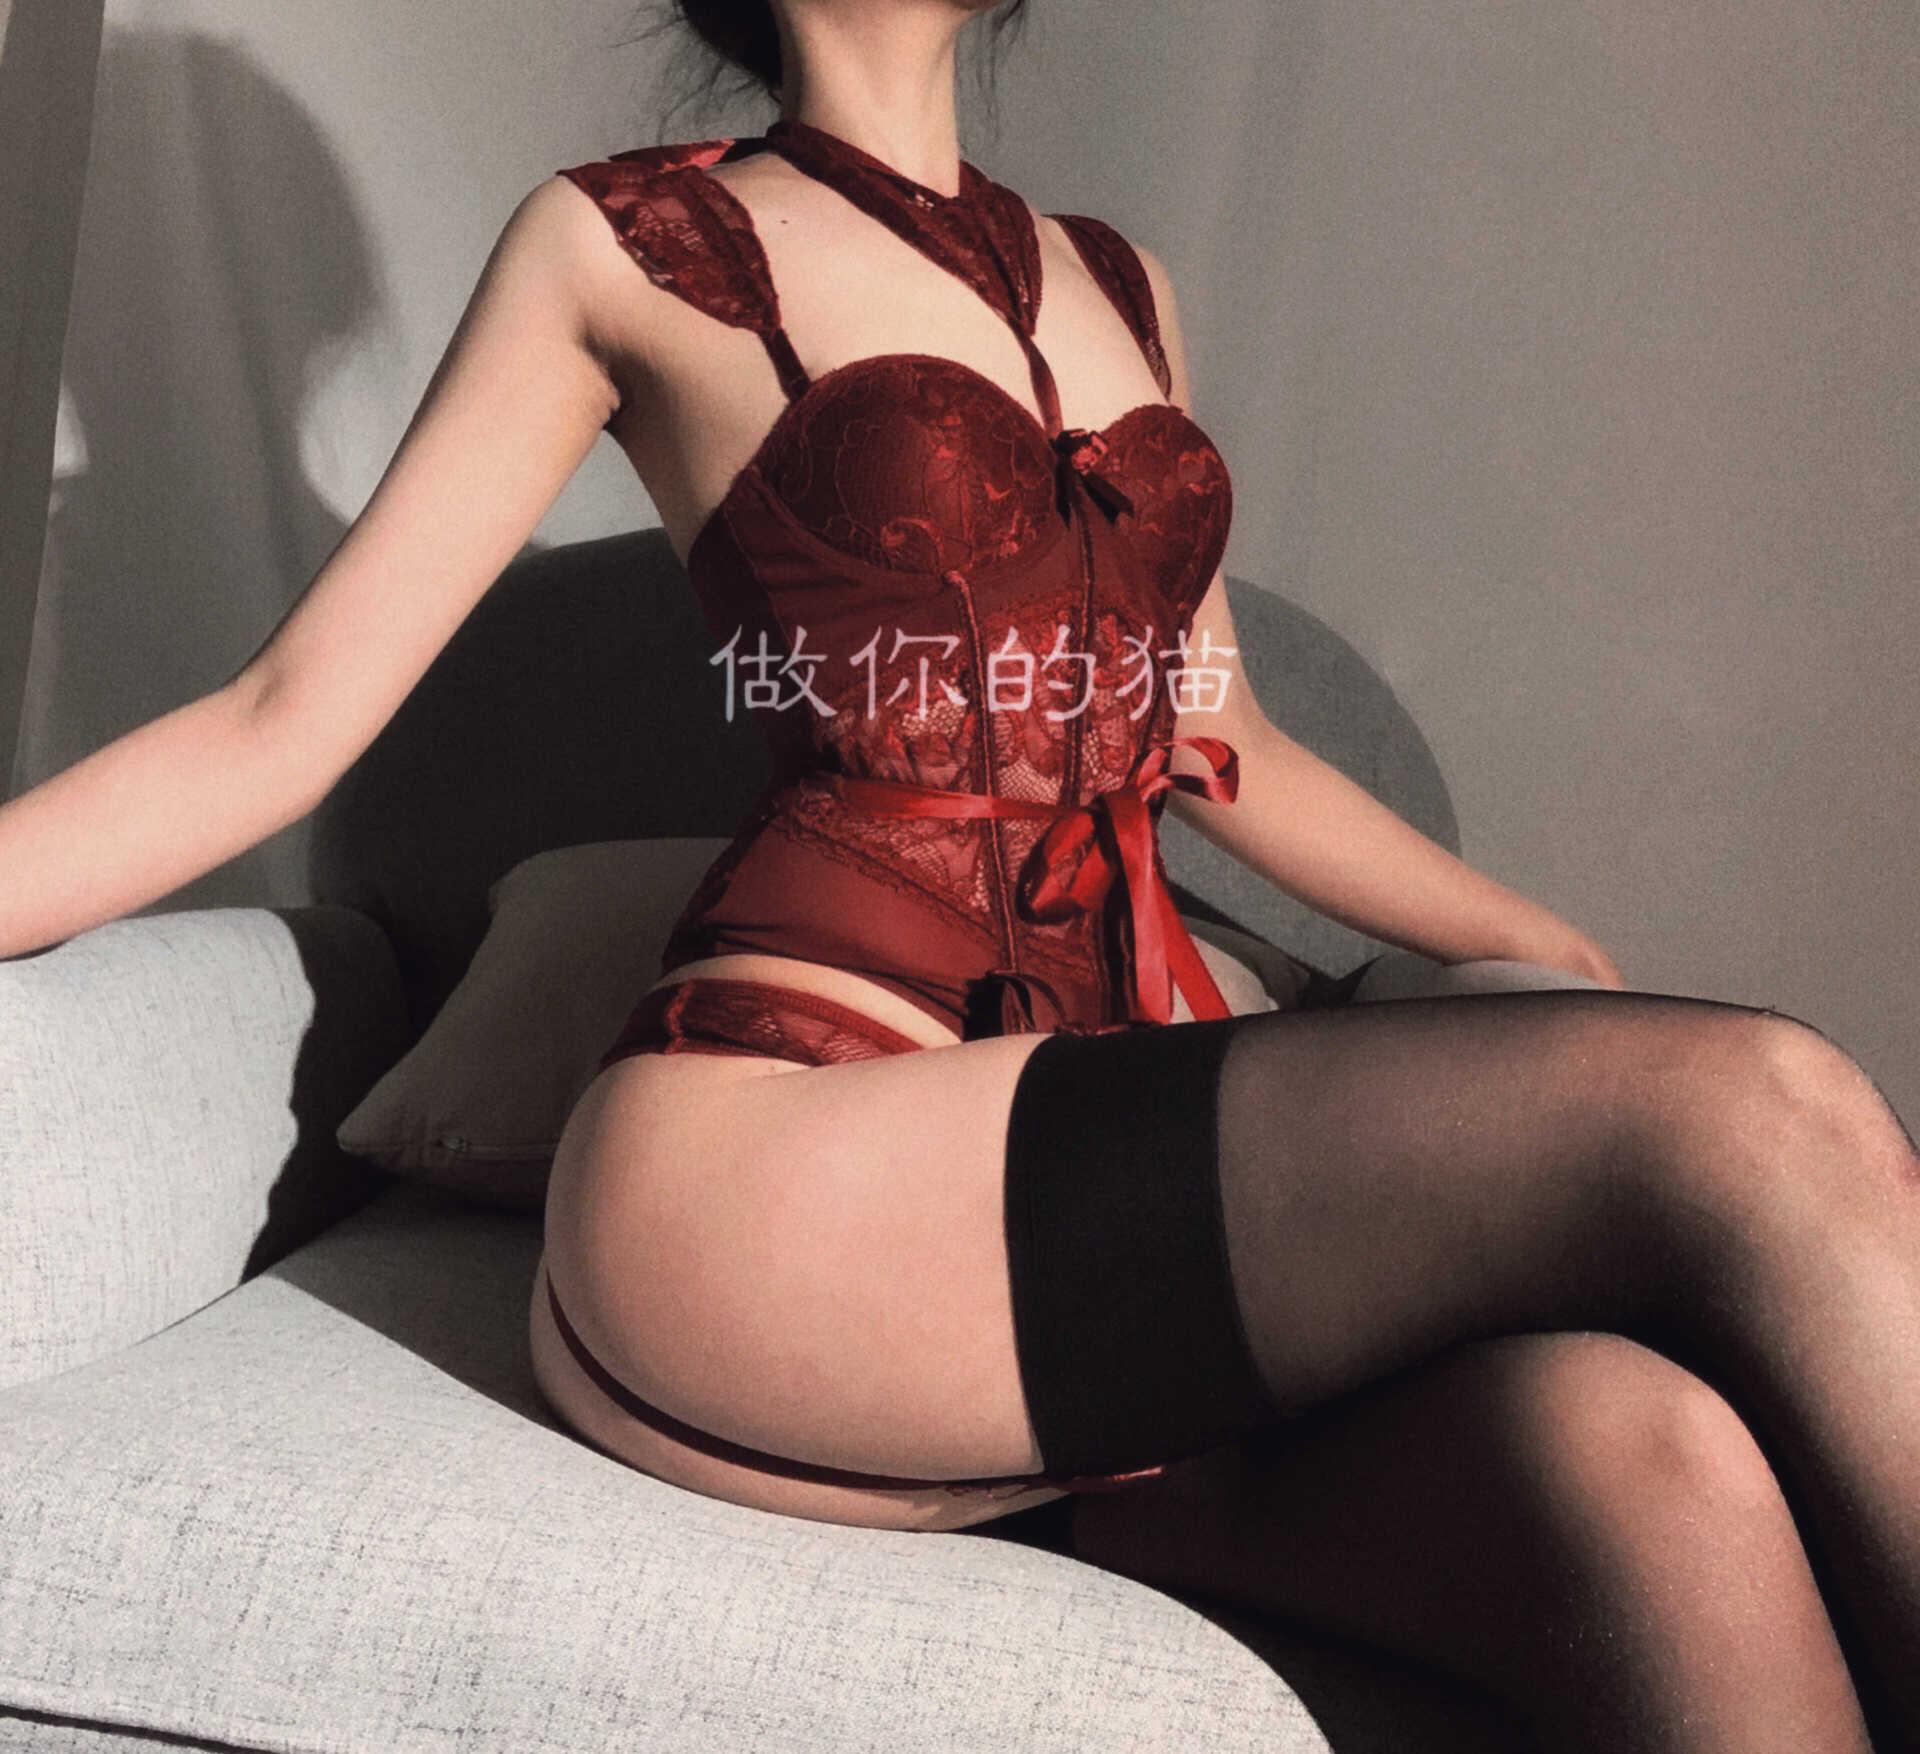 Fashion Pakaian Wanita Halter Bustier Atasan Paha Garter Belt Sexy Maid Kostum Cosplay Korset Renda Erotis Pakaian Dalam Wanita